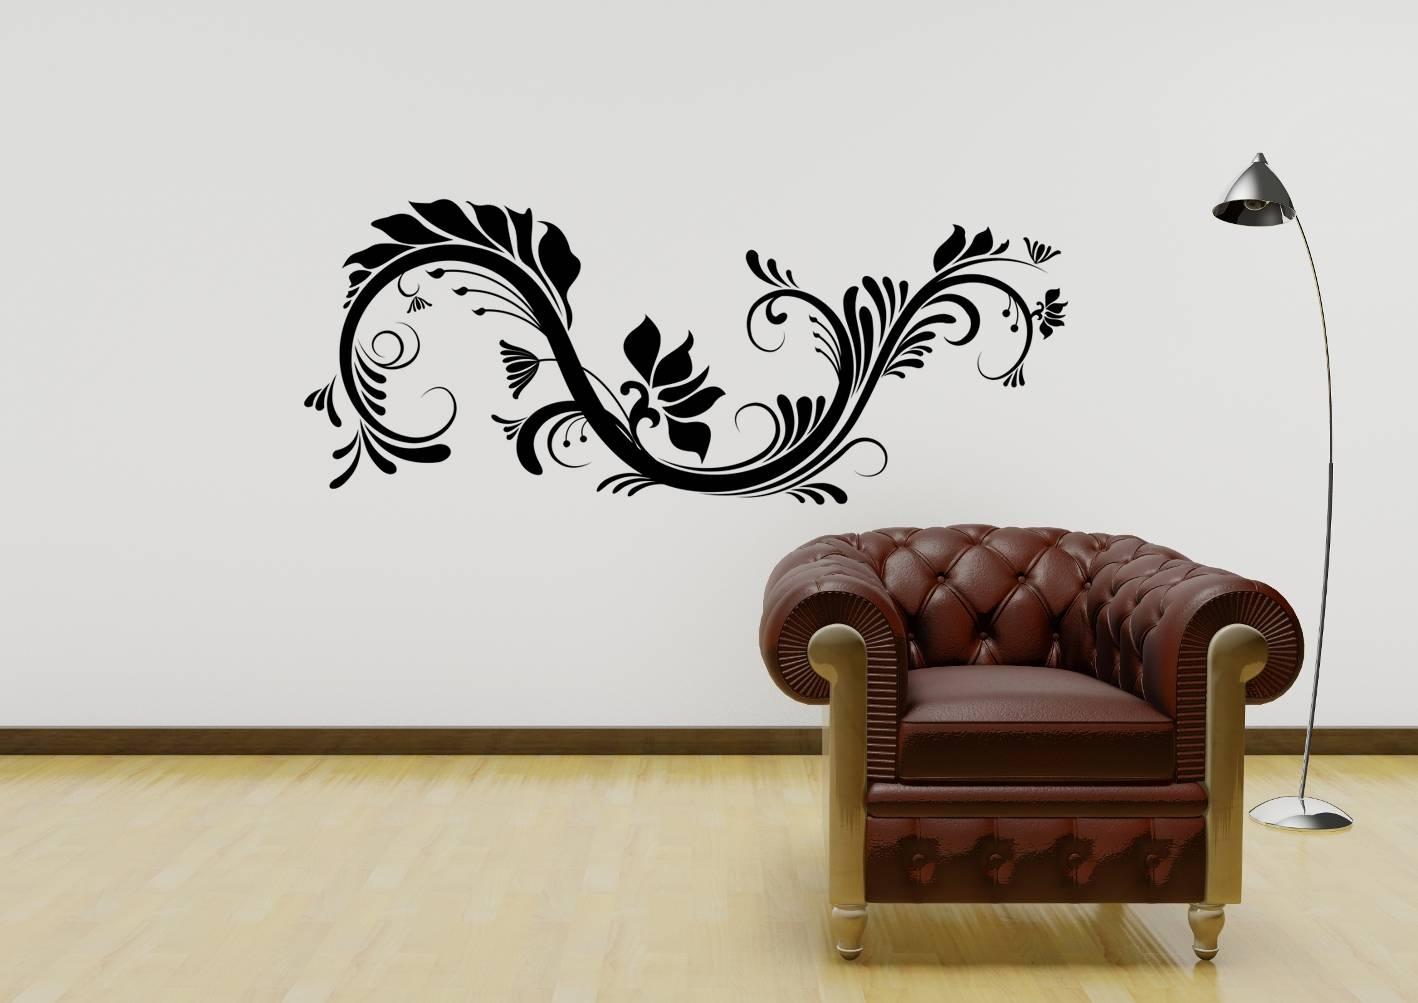 Vinyl Wall Art Glamorous Wall Art Design – Home Design Ideas Inside 2017 Glamorous Wall Art (Gallery 19 of 30)